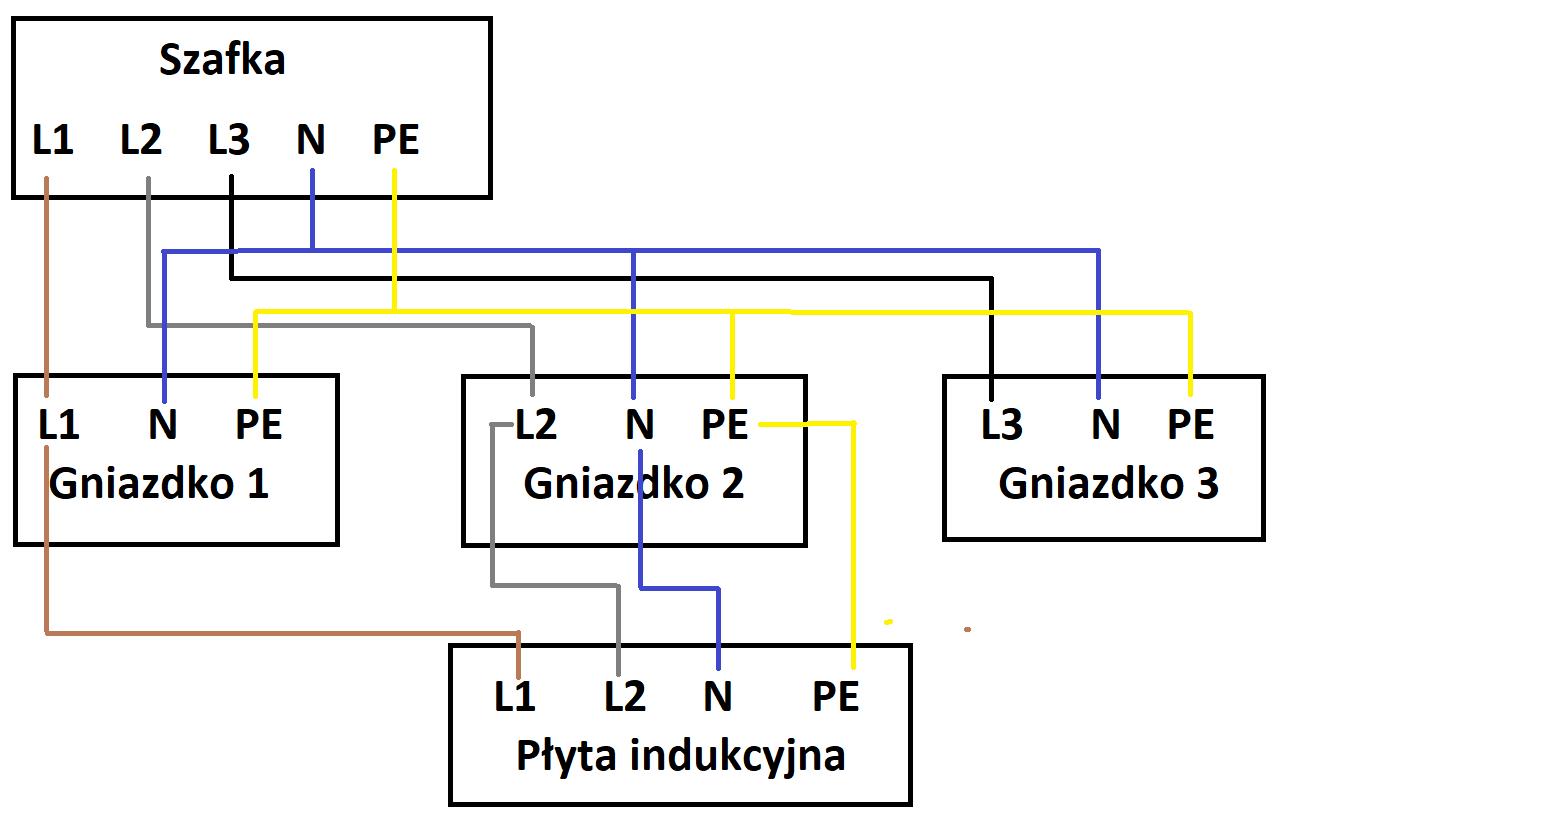 Plyta Indukcyjna 400v A Gniazdka 230v Z 3 Roznych Faz